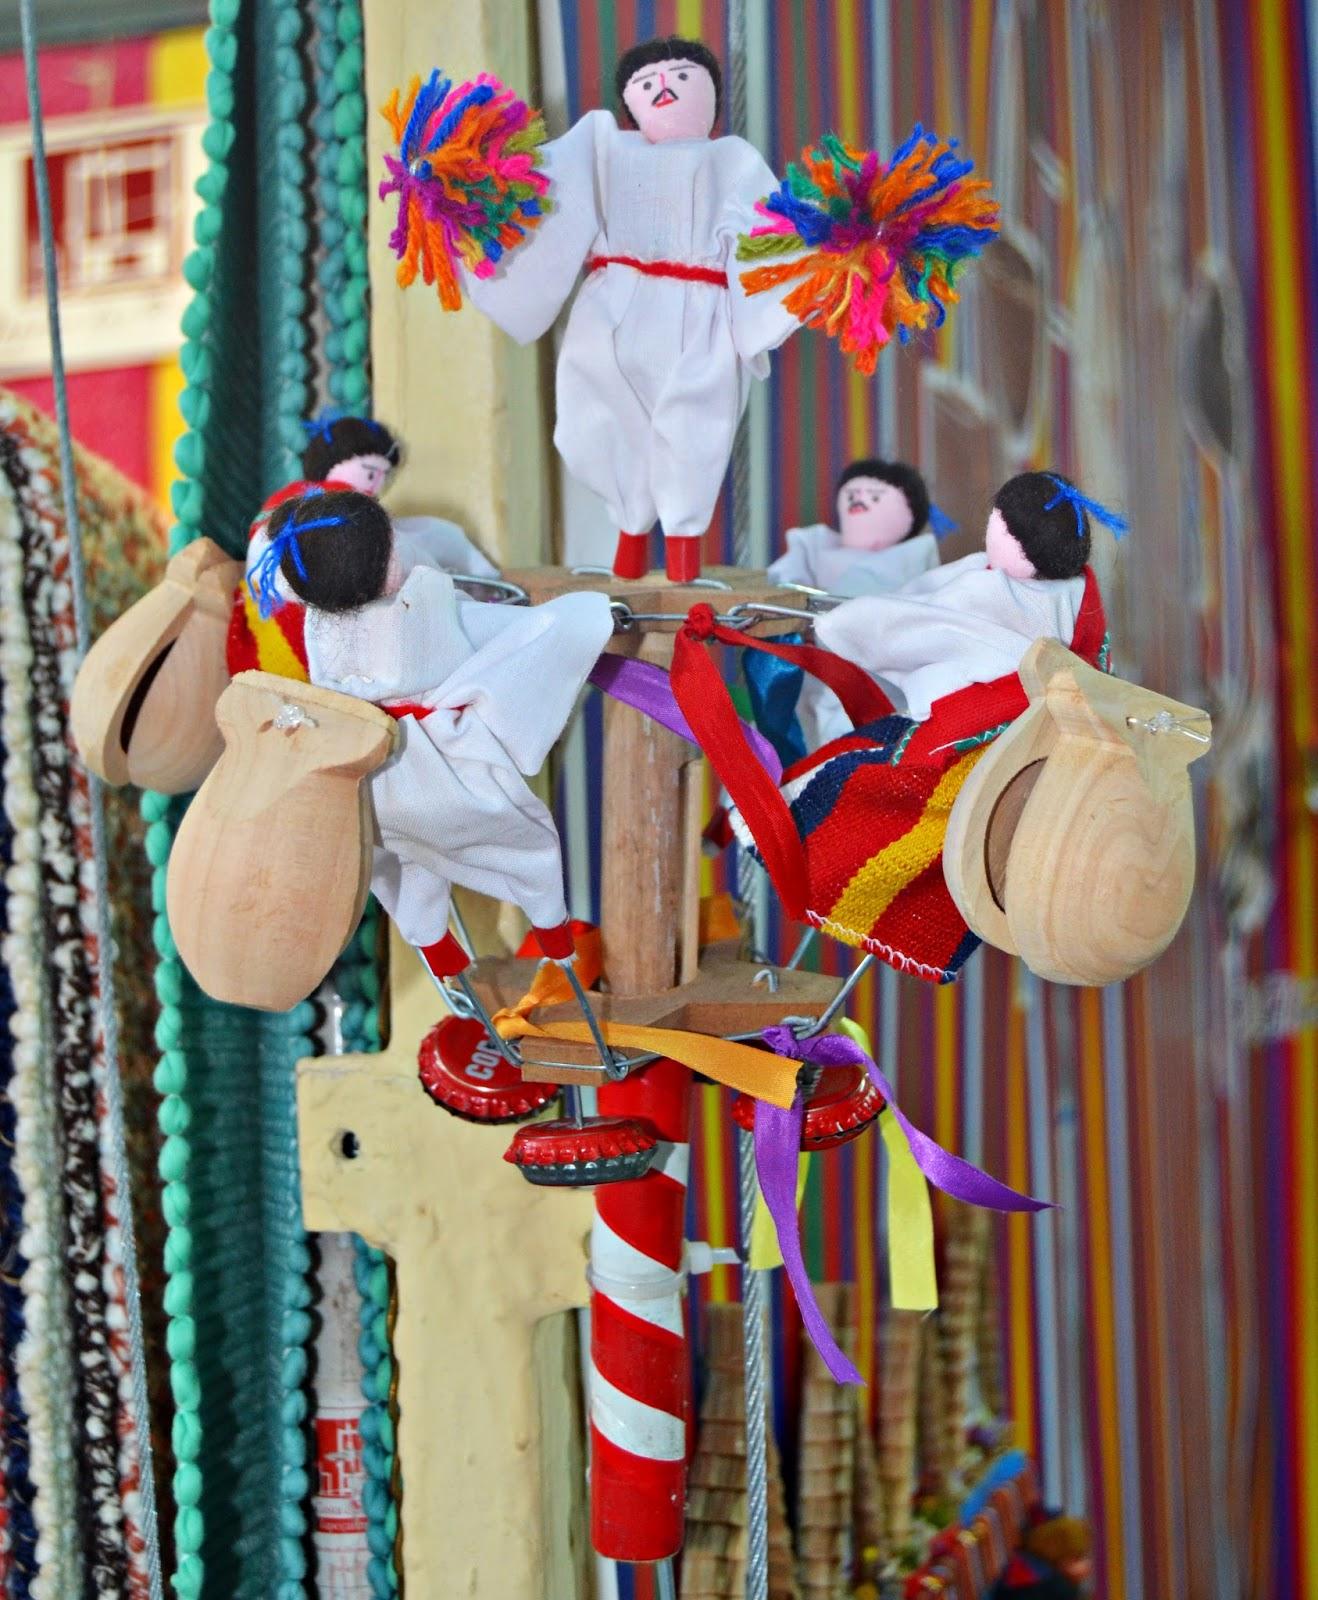 Armario Hemnes ~ Feira de Artesanato de Vila do Conde 2016